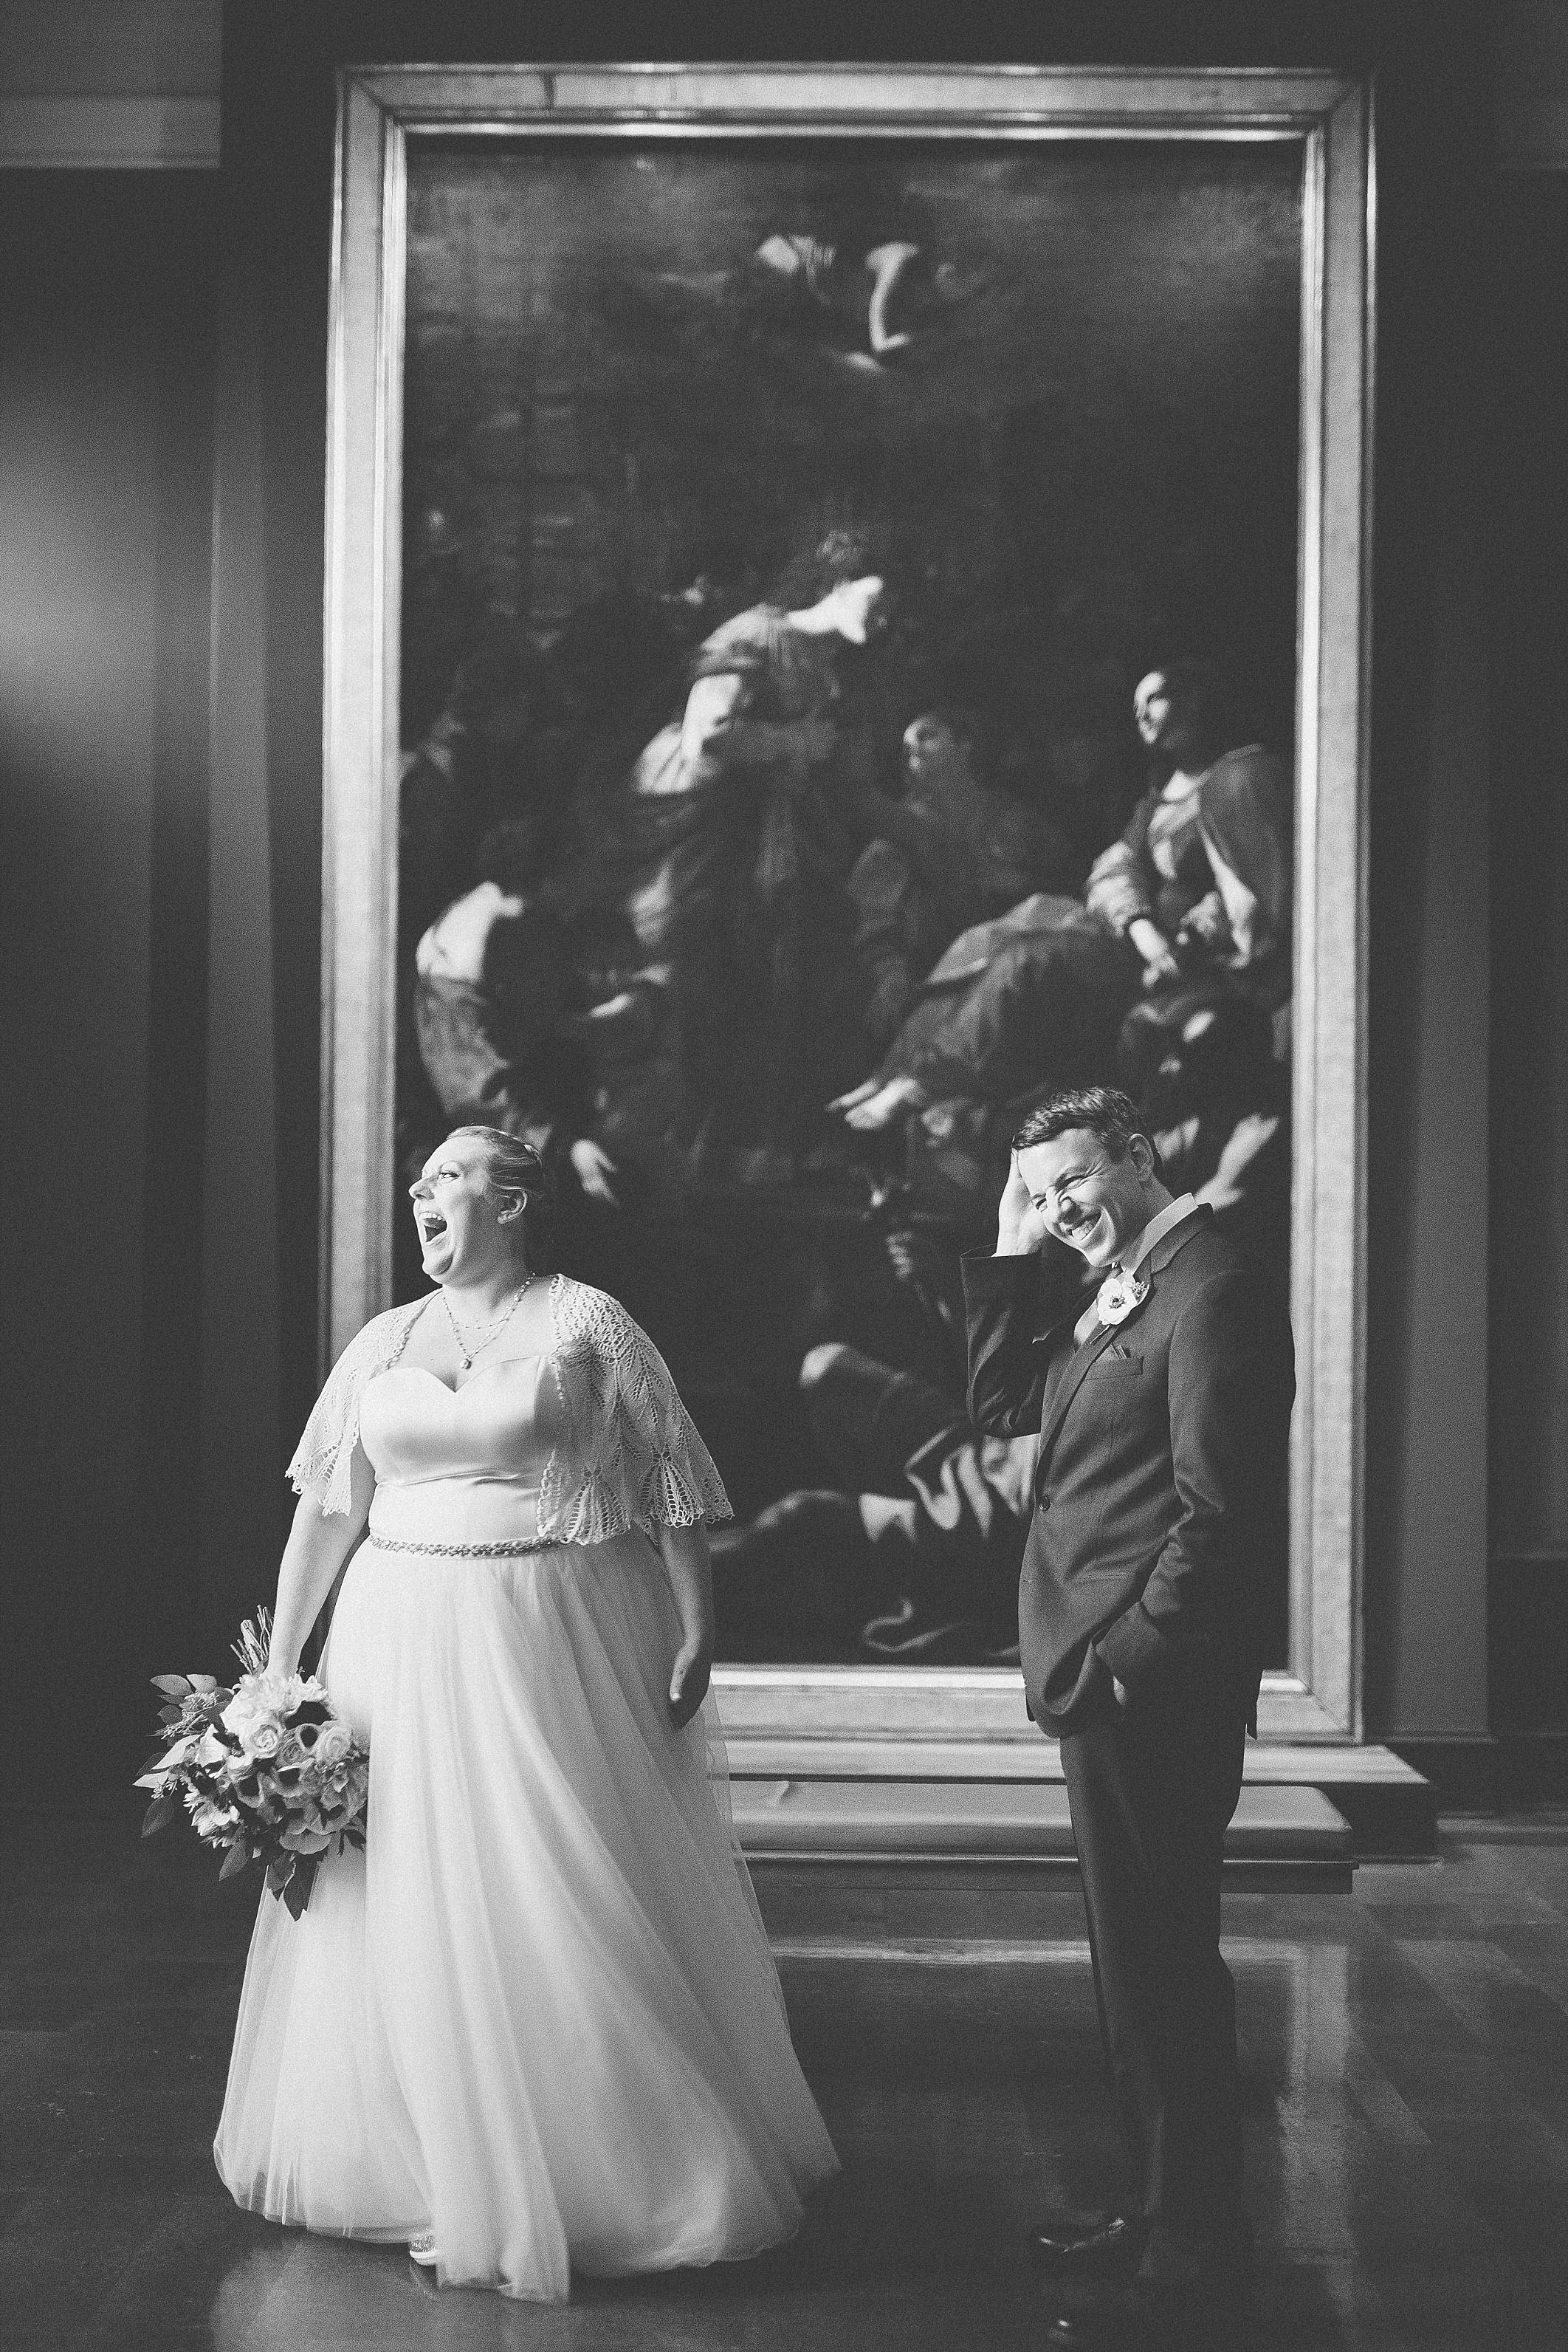 wedding-photographer-dayton-ohio_0015.jpg